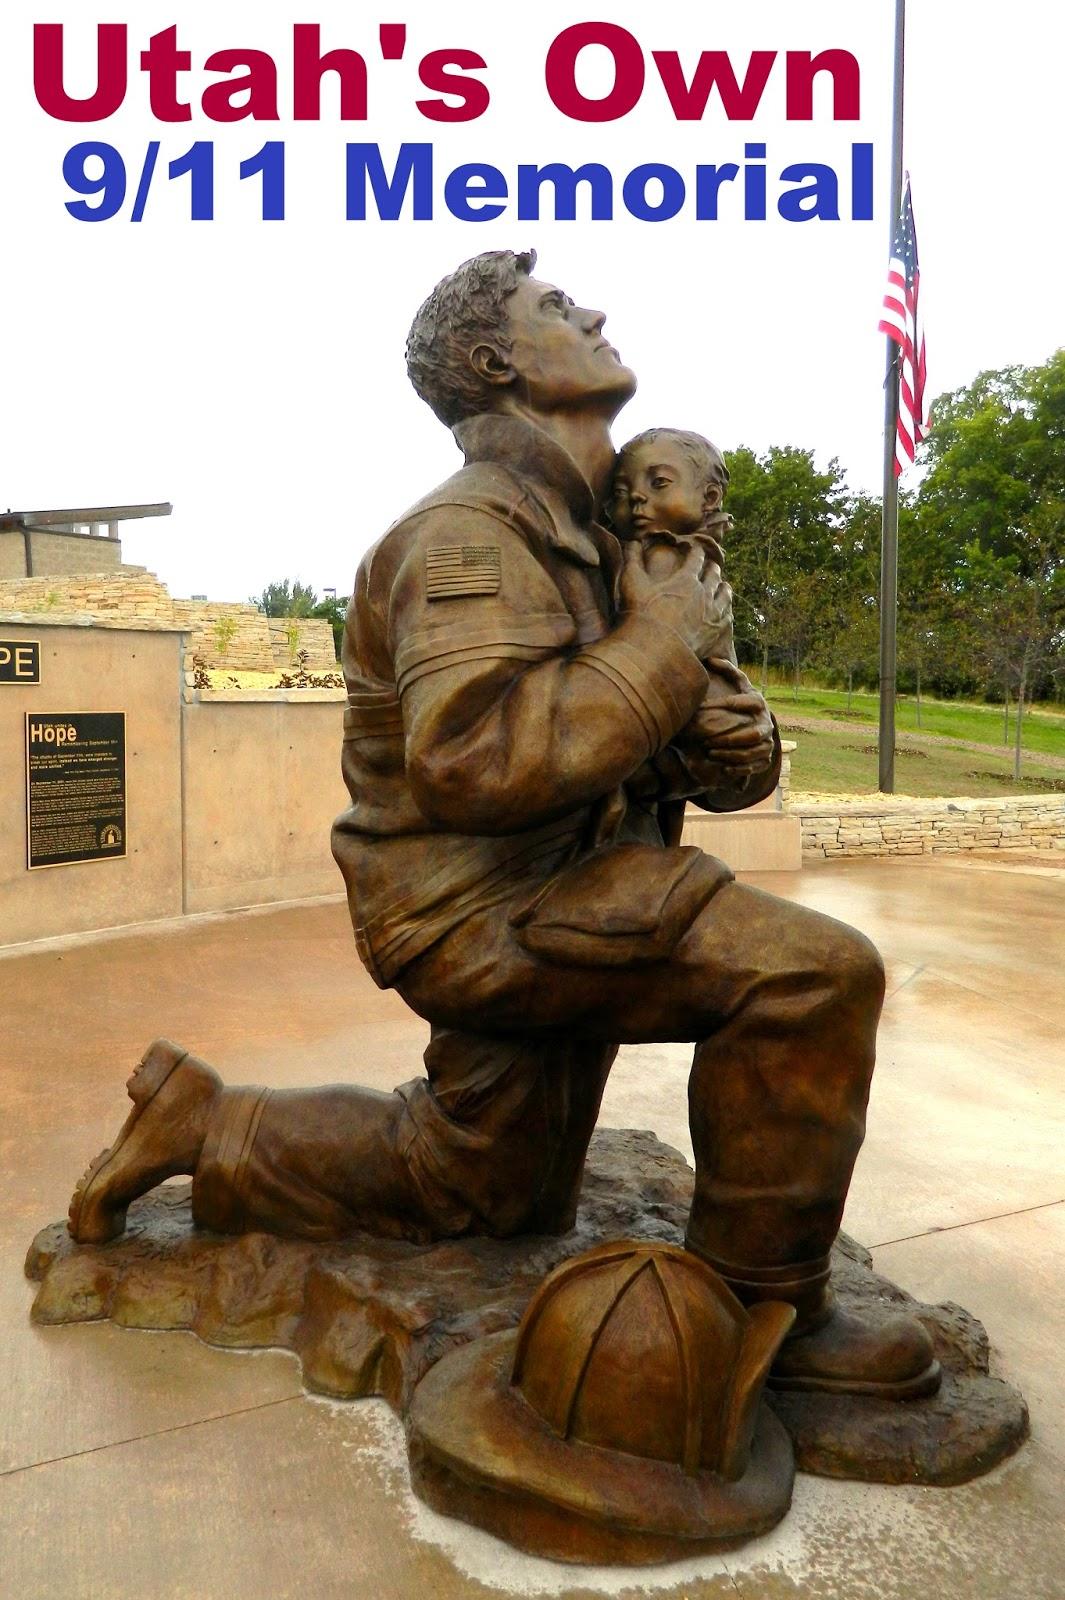 Createjoy2day September 11th Memorial In Kaysville Utah